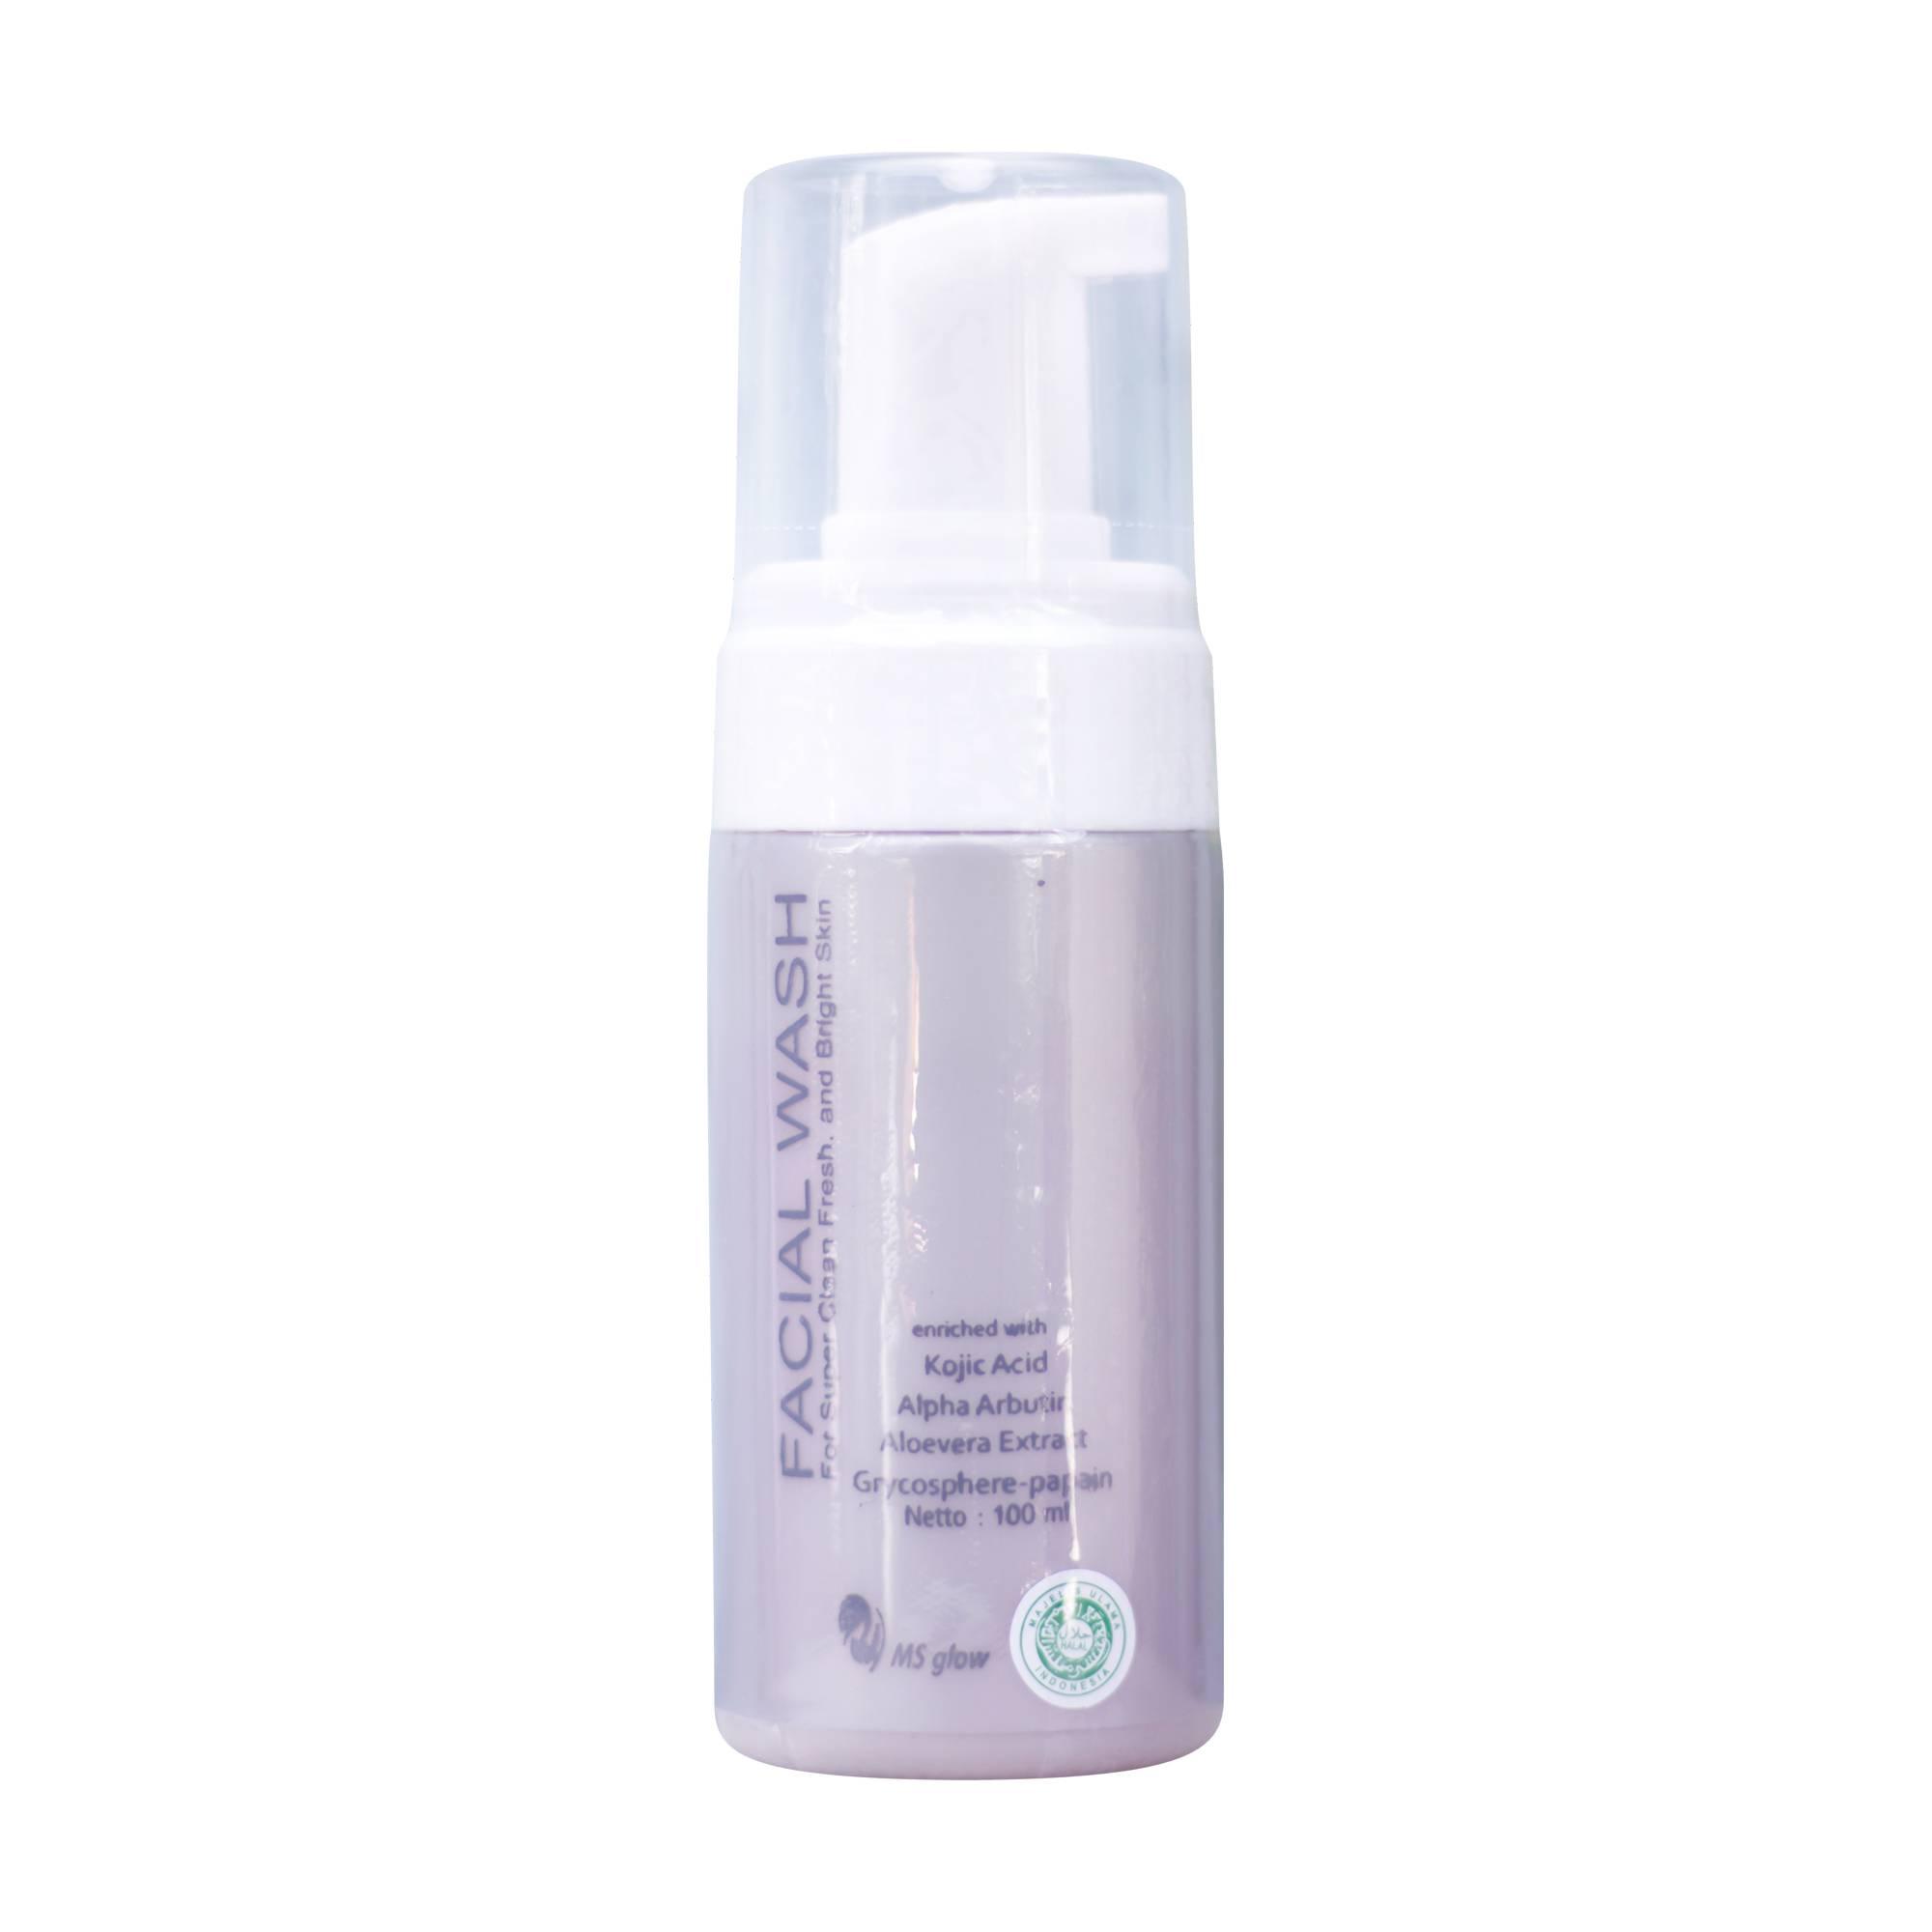 Shokubutsu Men Facial Scrub Sabun Cuci Muka 130g Update Daftar Acnes Creamy Wash 100 Gram Besar Obat Jerawat Gr 100gr Facialwash Otstore Source The Sleeve